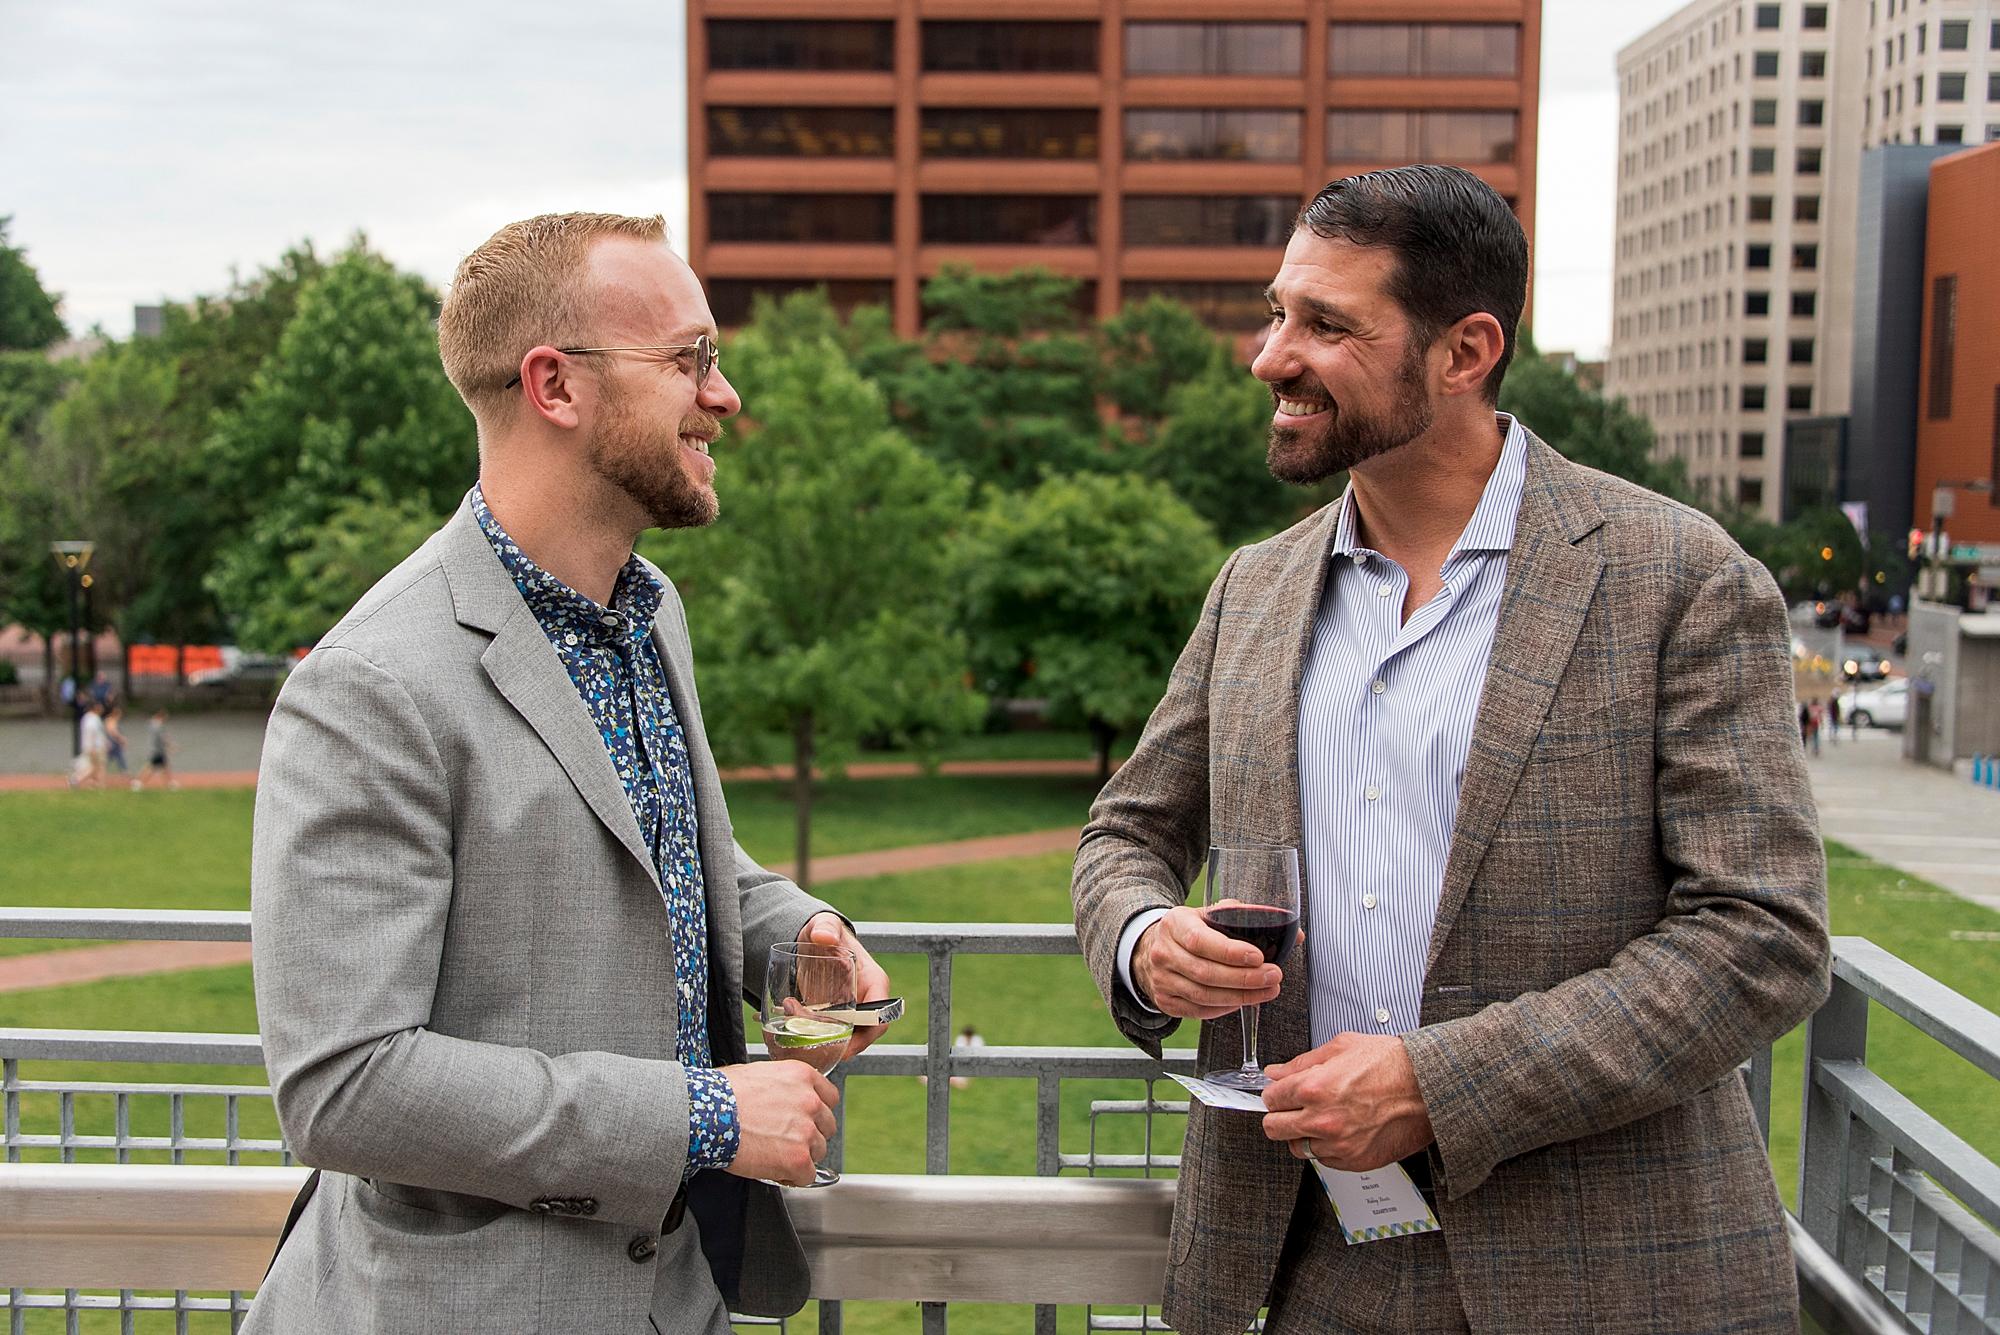 Dan_and_Byron_Love_by_Joe_Mac_Philadelphia_Wedding_LGBTQ_Photography_Gay_Independence_visitor_Center_109.JPG